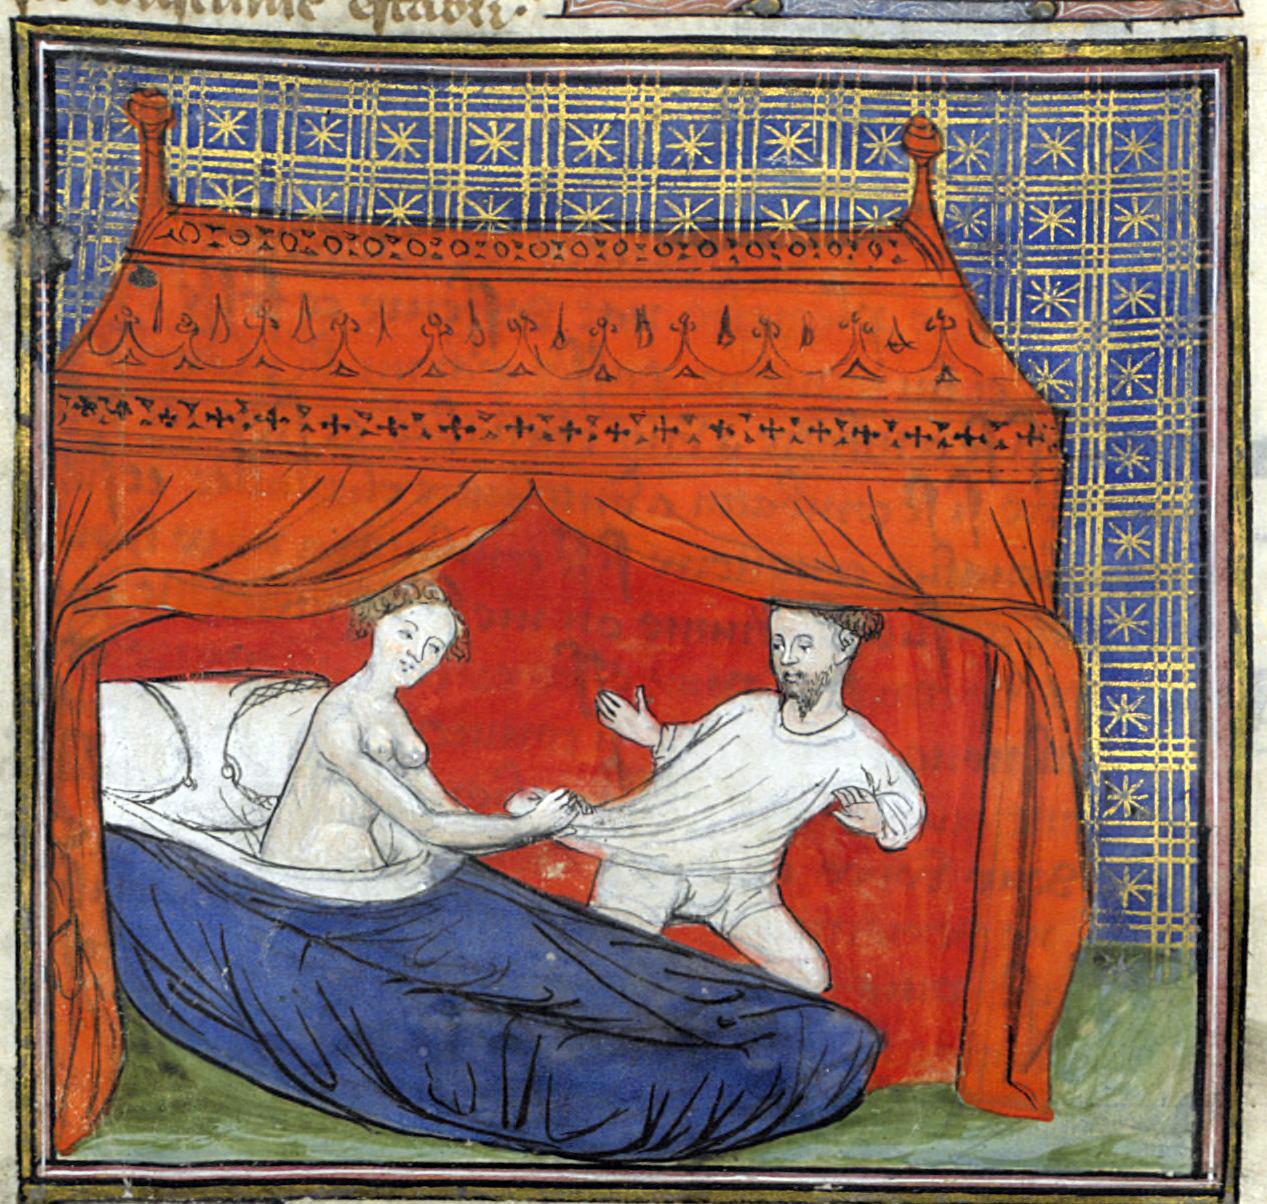 la-seduzione-forzata-miniatura-le-livre-de-lancelot-du-lac